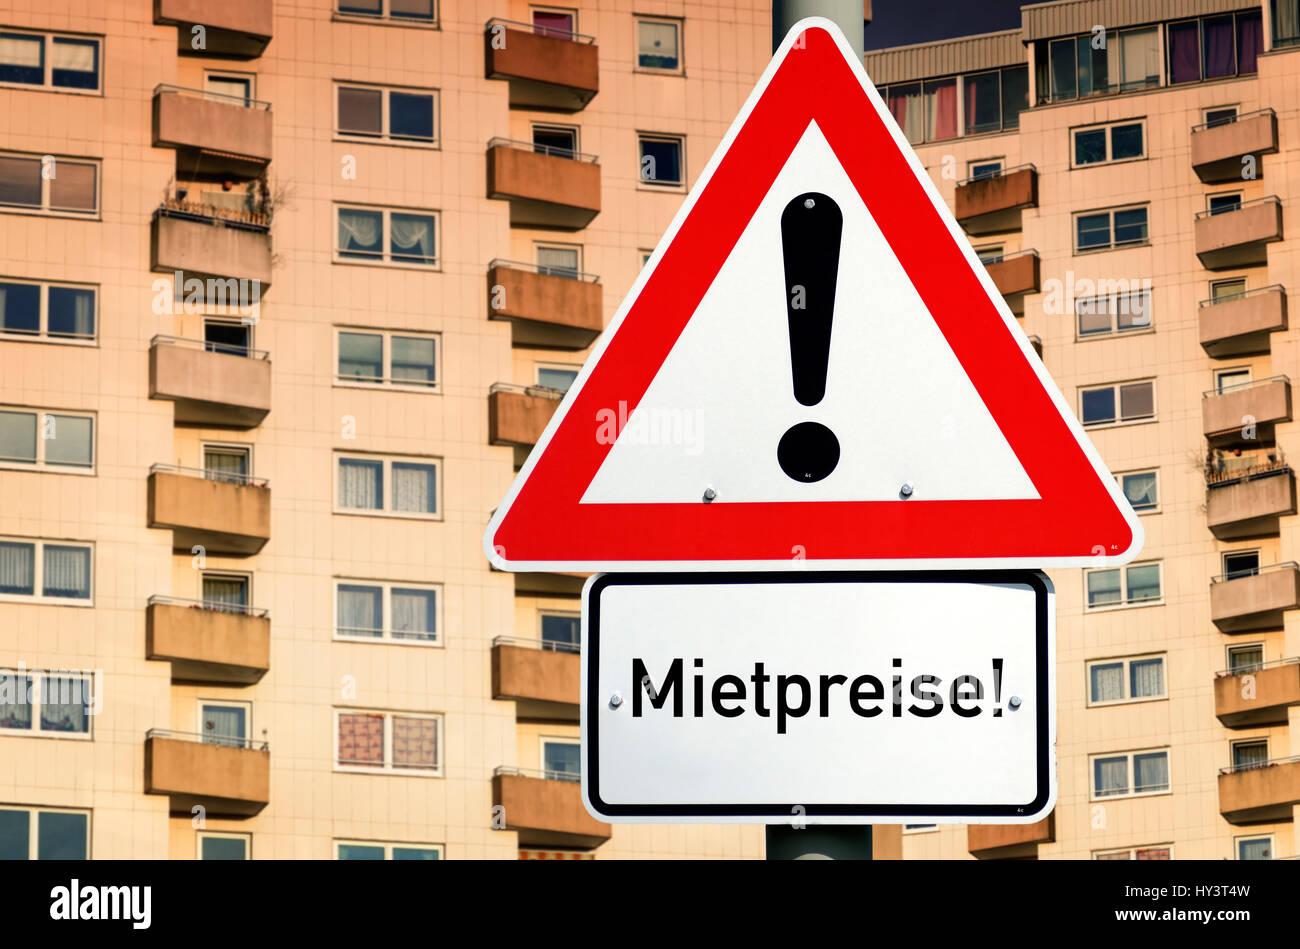 Sign with label Rent prices! before high rises, symbolic photo rent price brake, Schild mit Aufschrift Mietpreise! - Stock Image